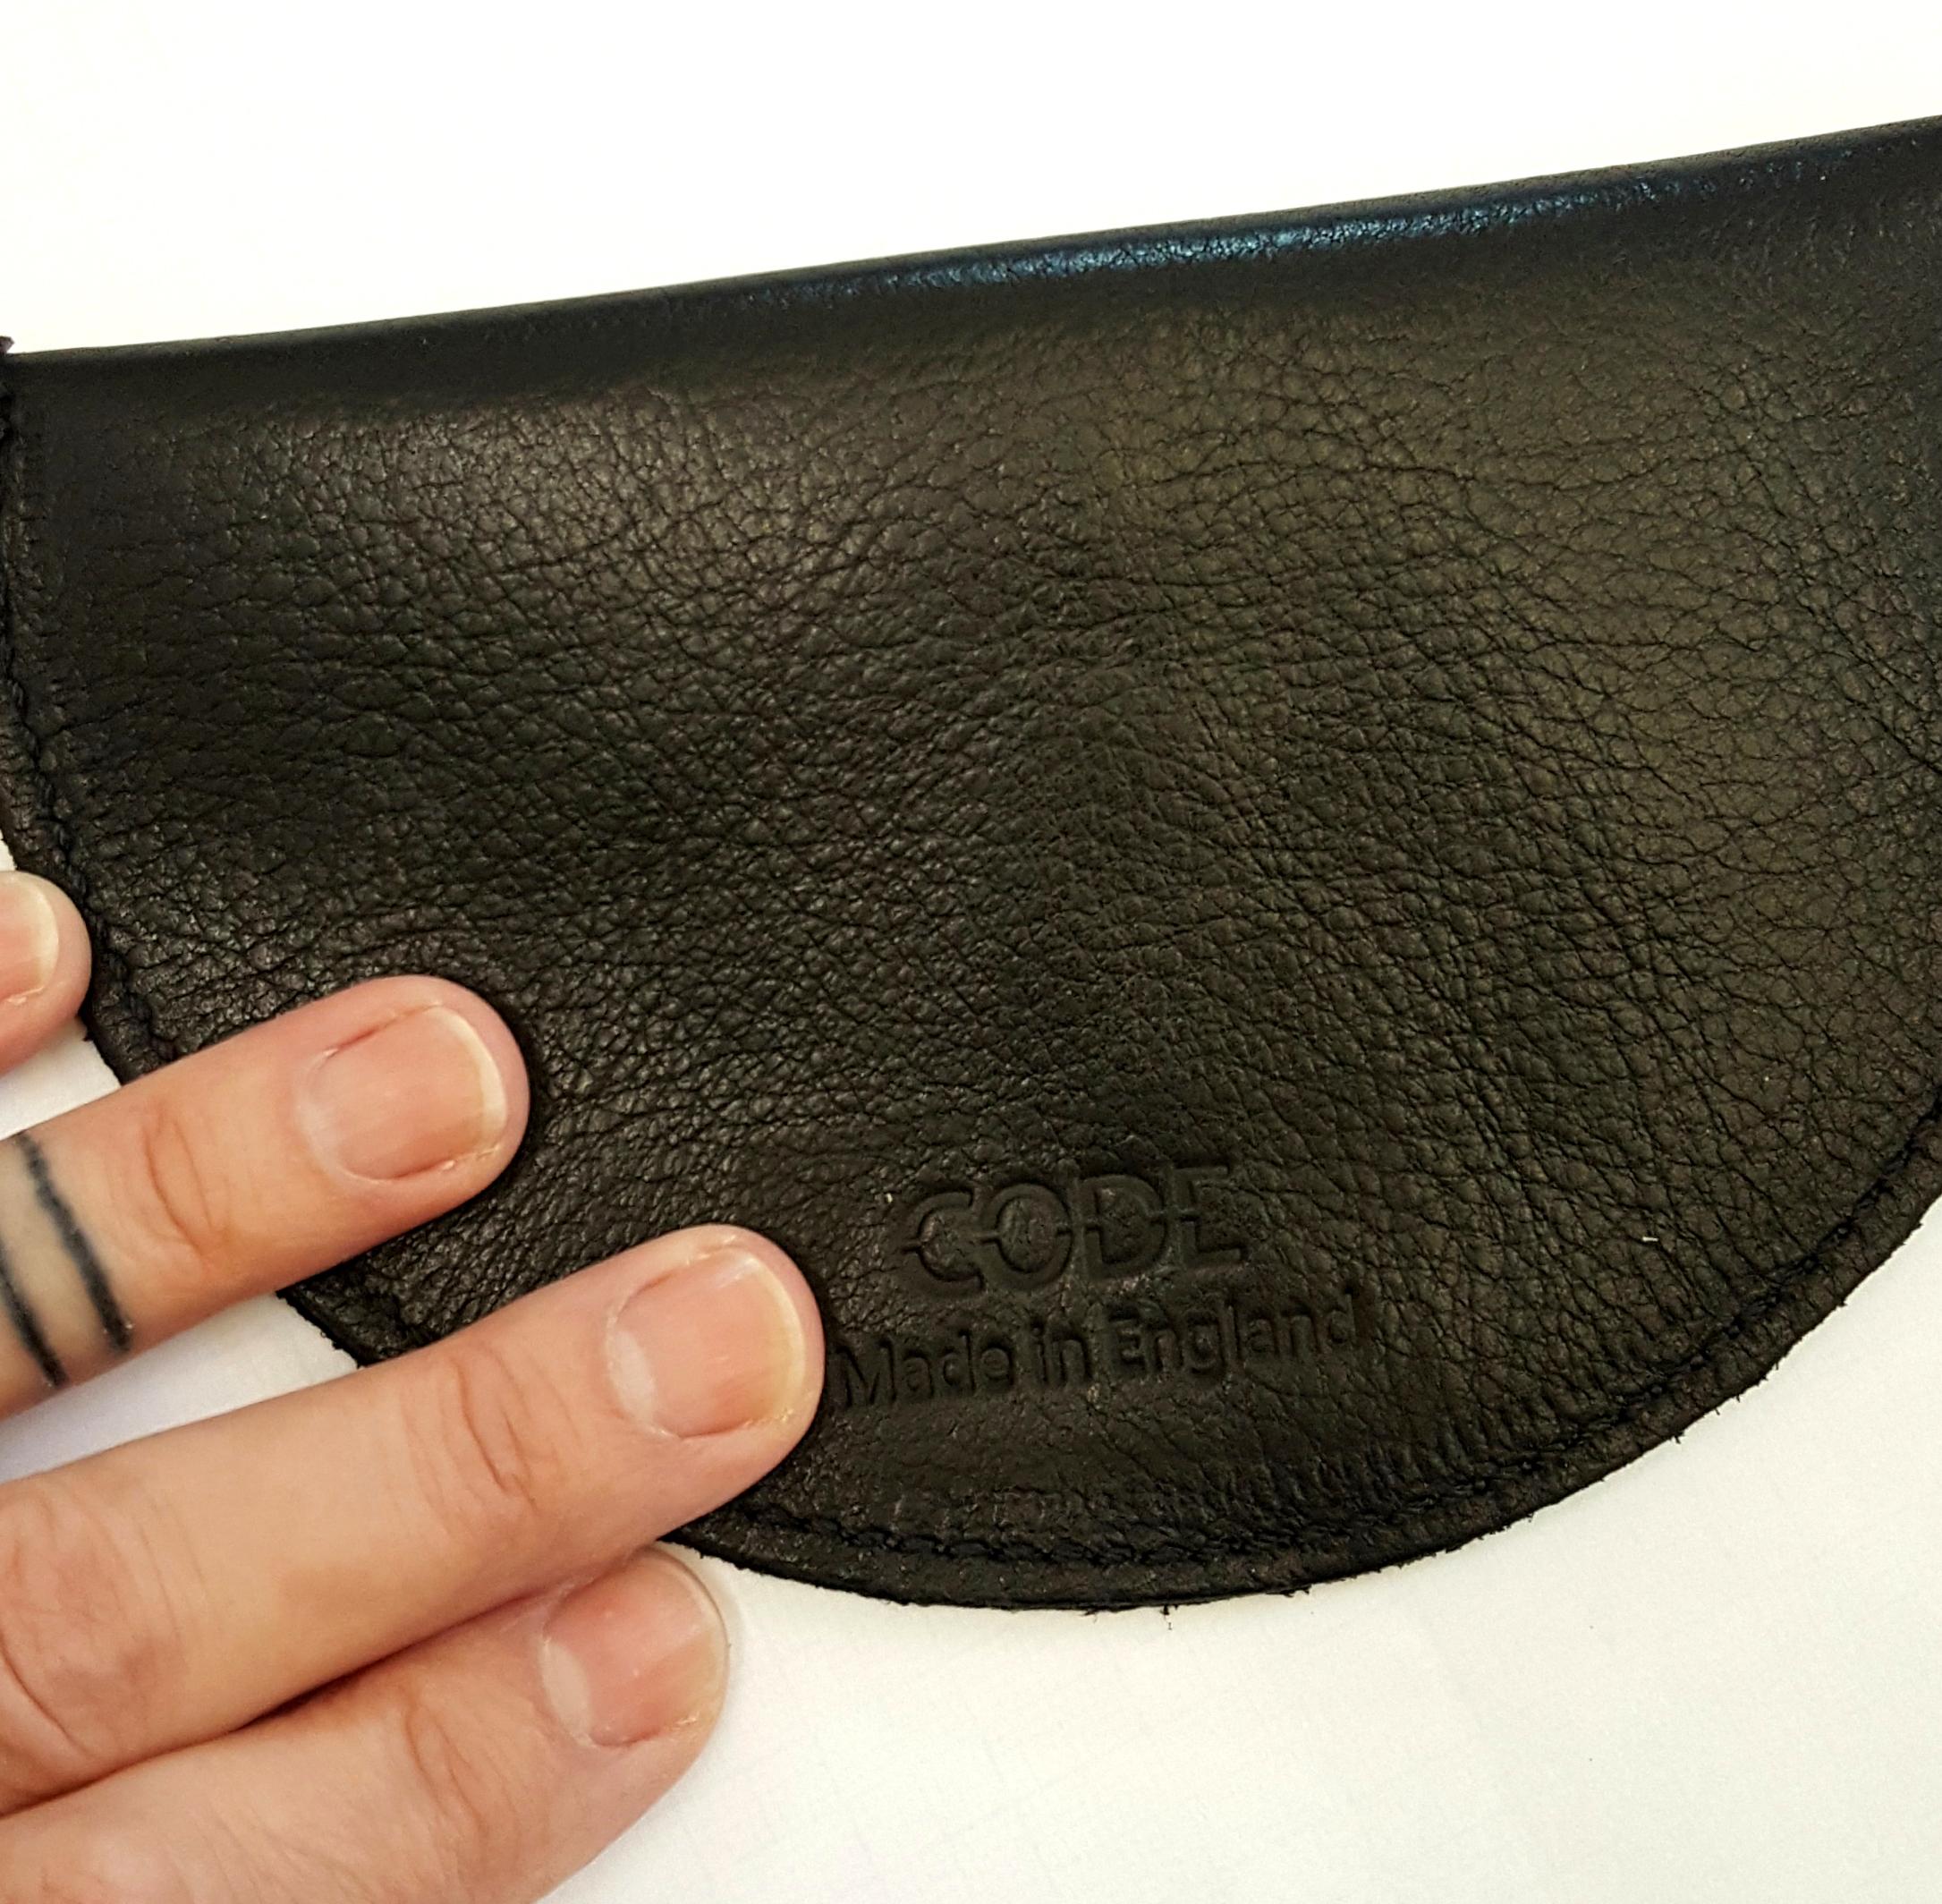 purse 3.jpg